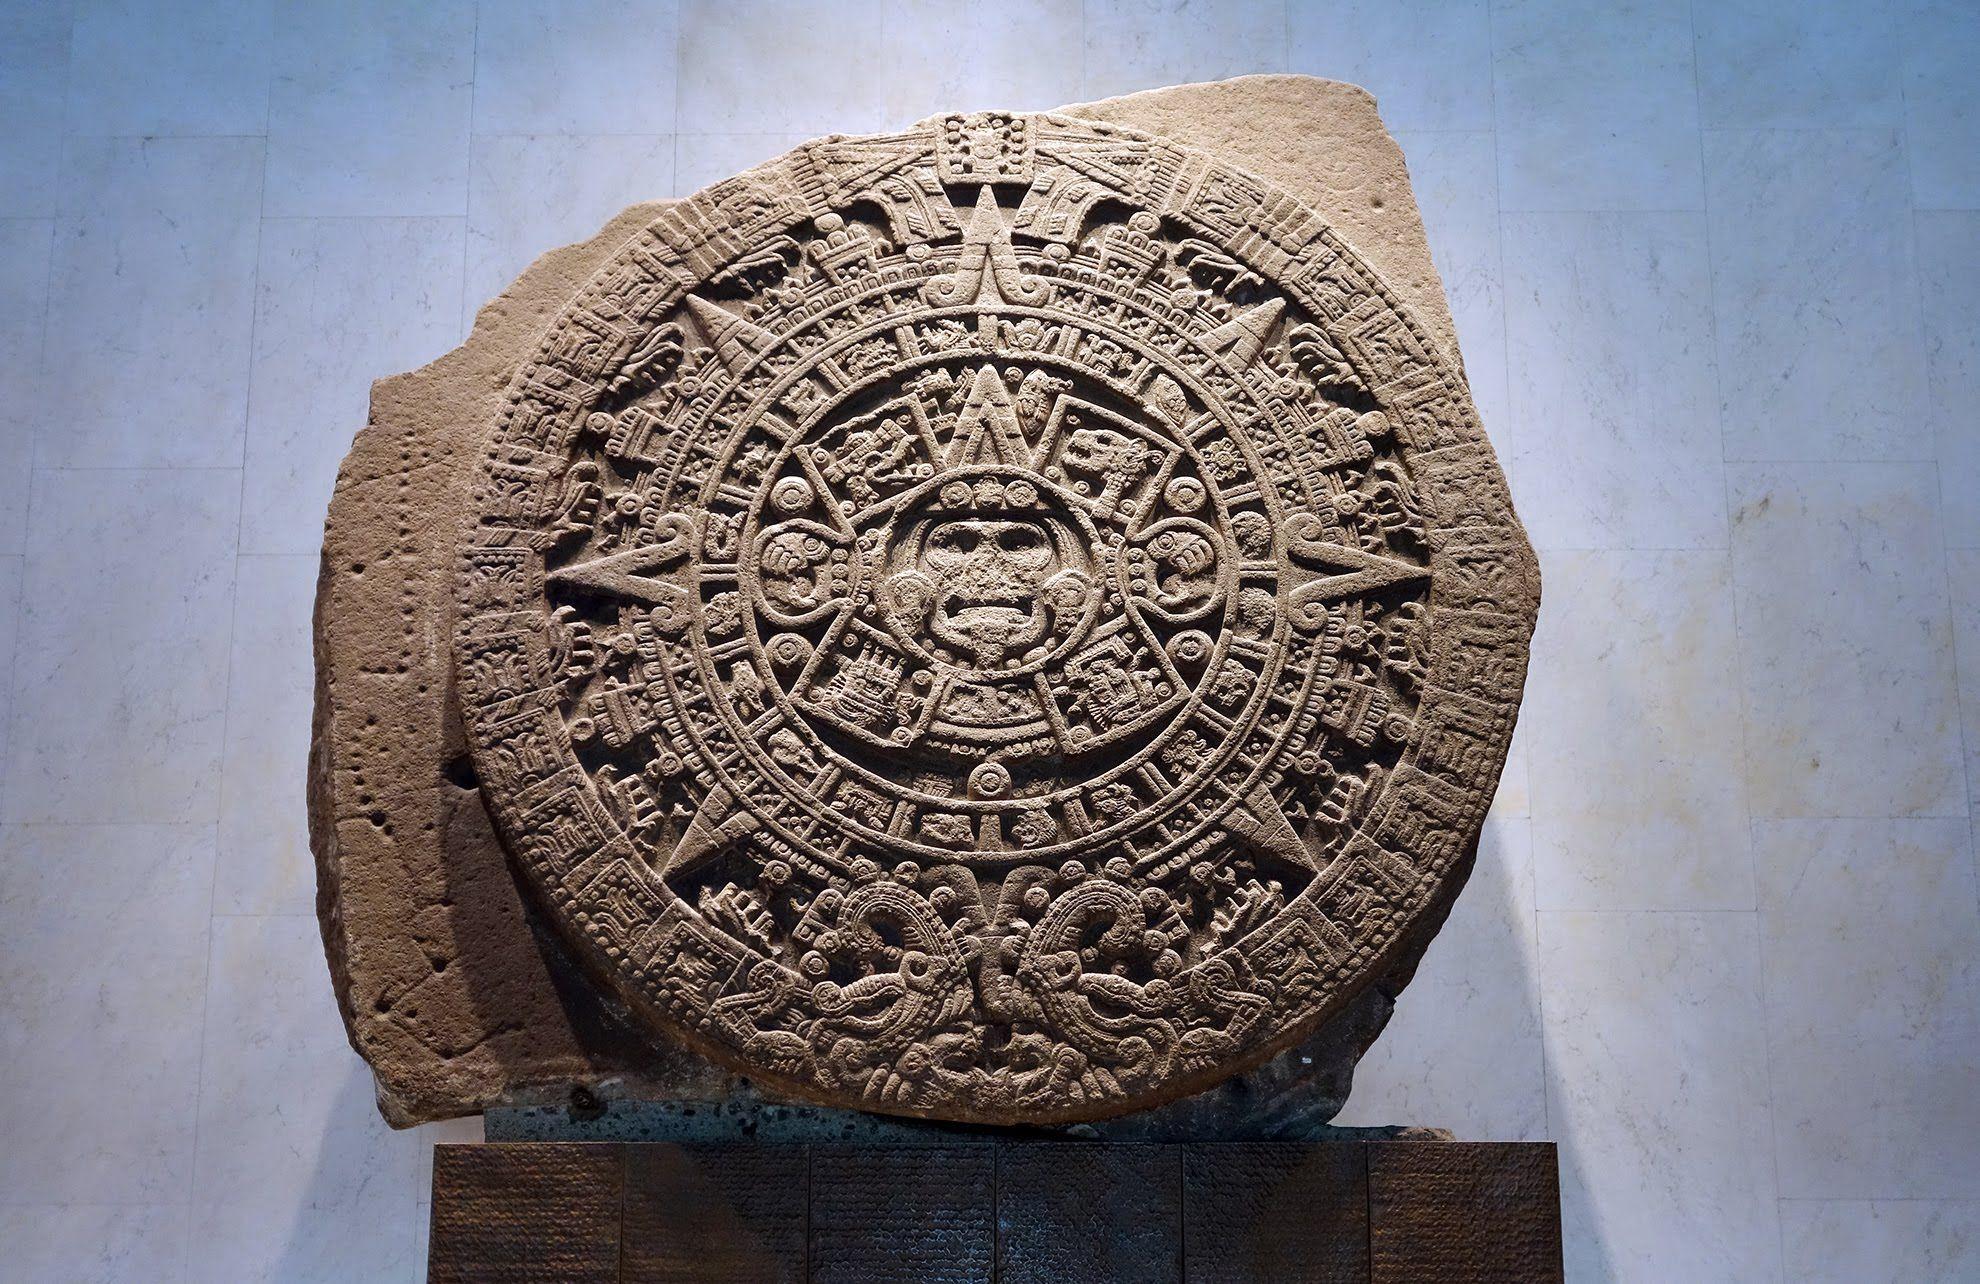 e93dc44faf6 The Sun Stone (The Calendar Stone)